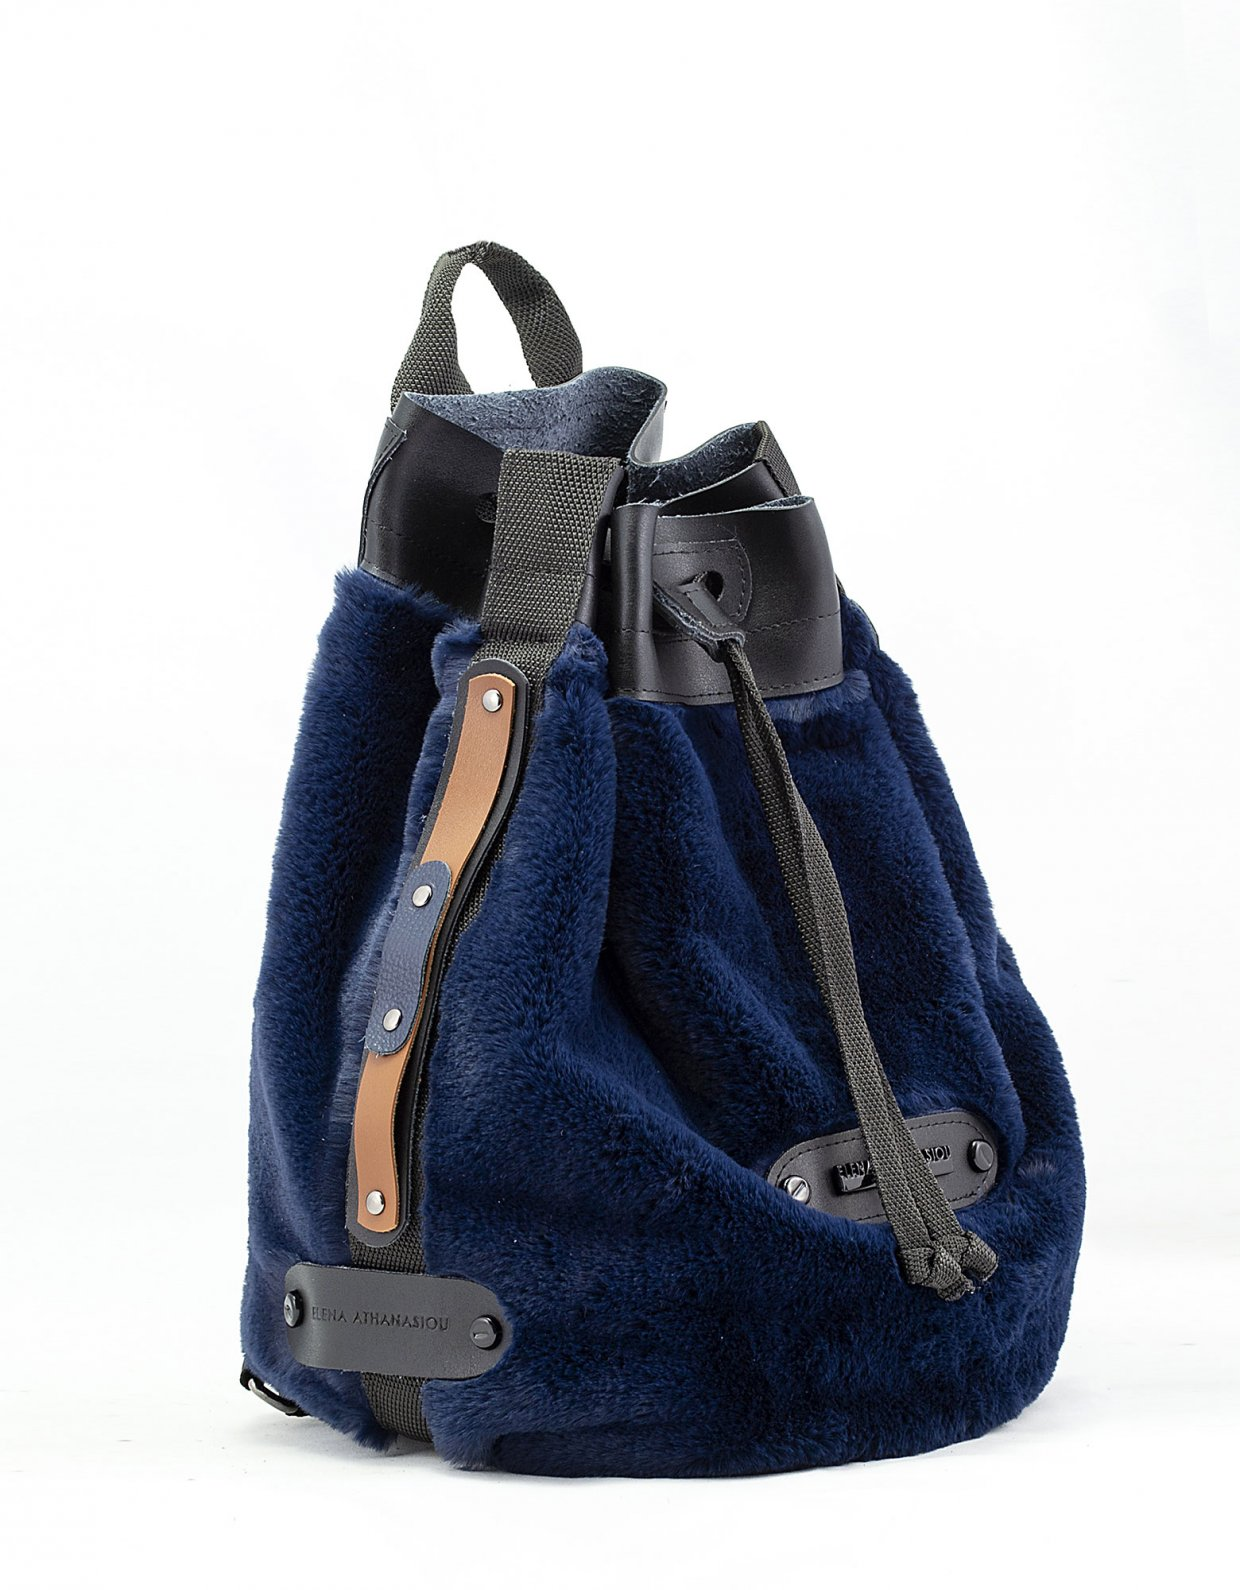 Elena Athanasiou Fluffy backpack blue